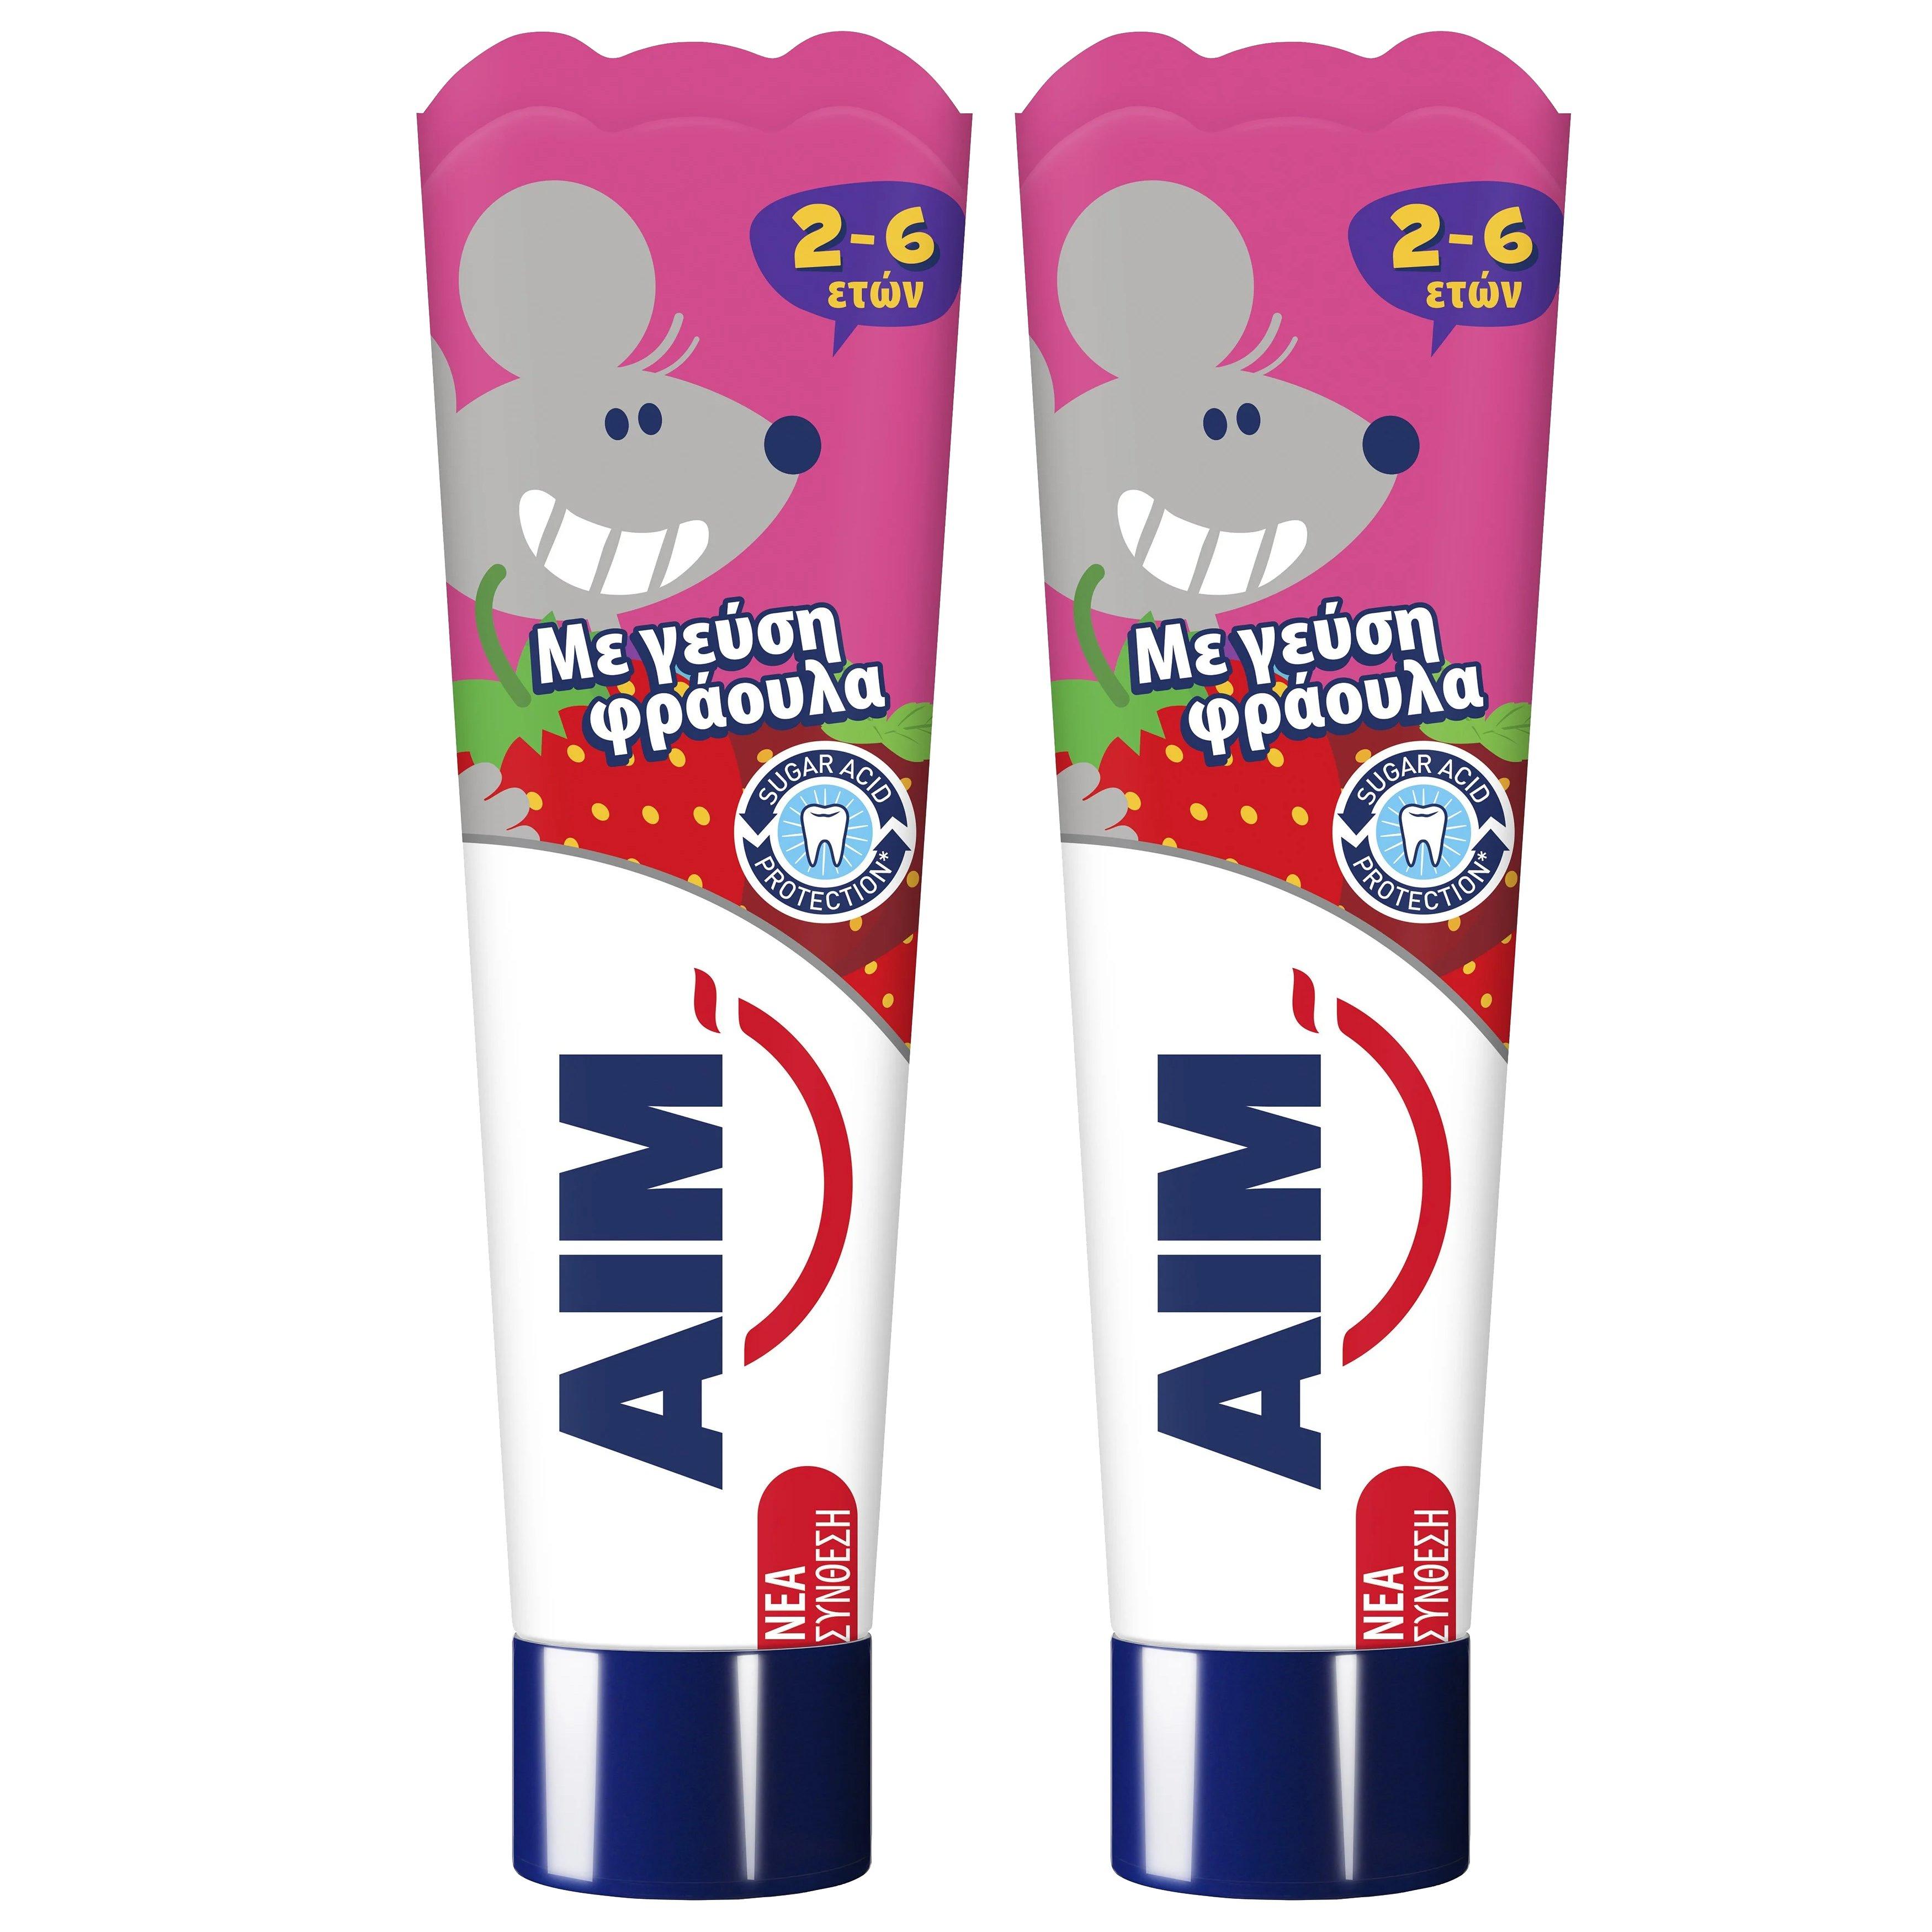 Aim Πακέτο Προσφοράς Kids Παιδική Οδοντόκρεμα Ειδική για τα Ευαίσθητα Δόντια του Παιδιού, Γεύση Φράουλα 2-6 Ετών 2x50ml 1+1 Δώρο